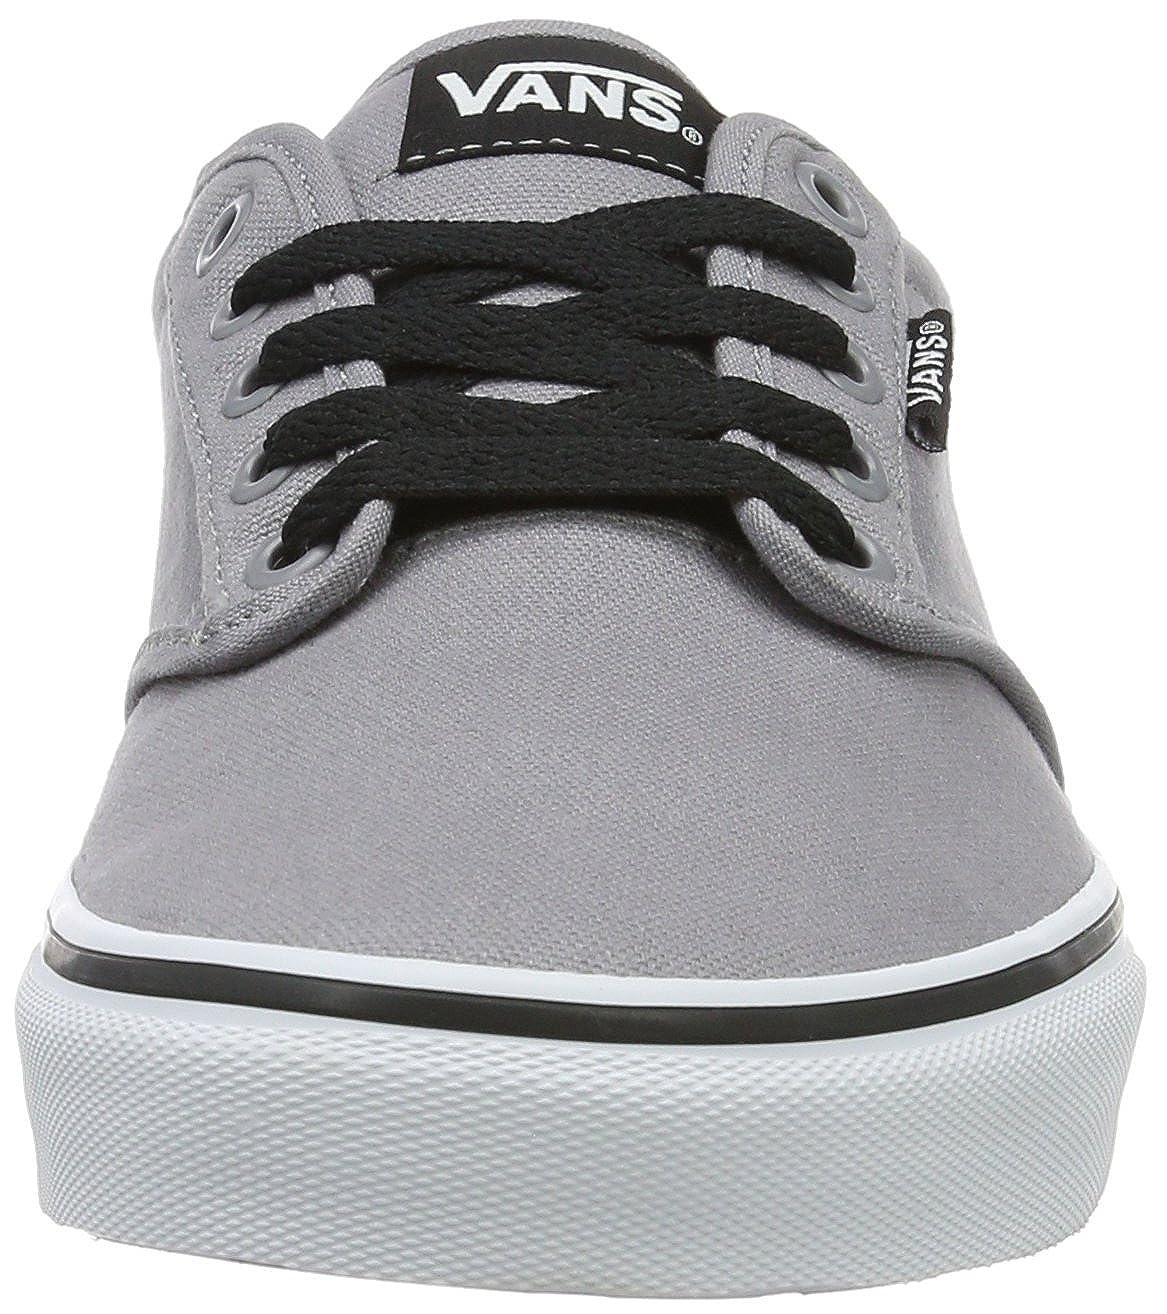 Essere in vendita VANS Sneaker Atwood 2 Tone Black Asphalt